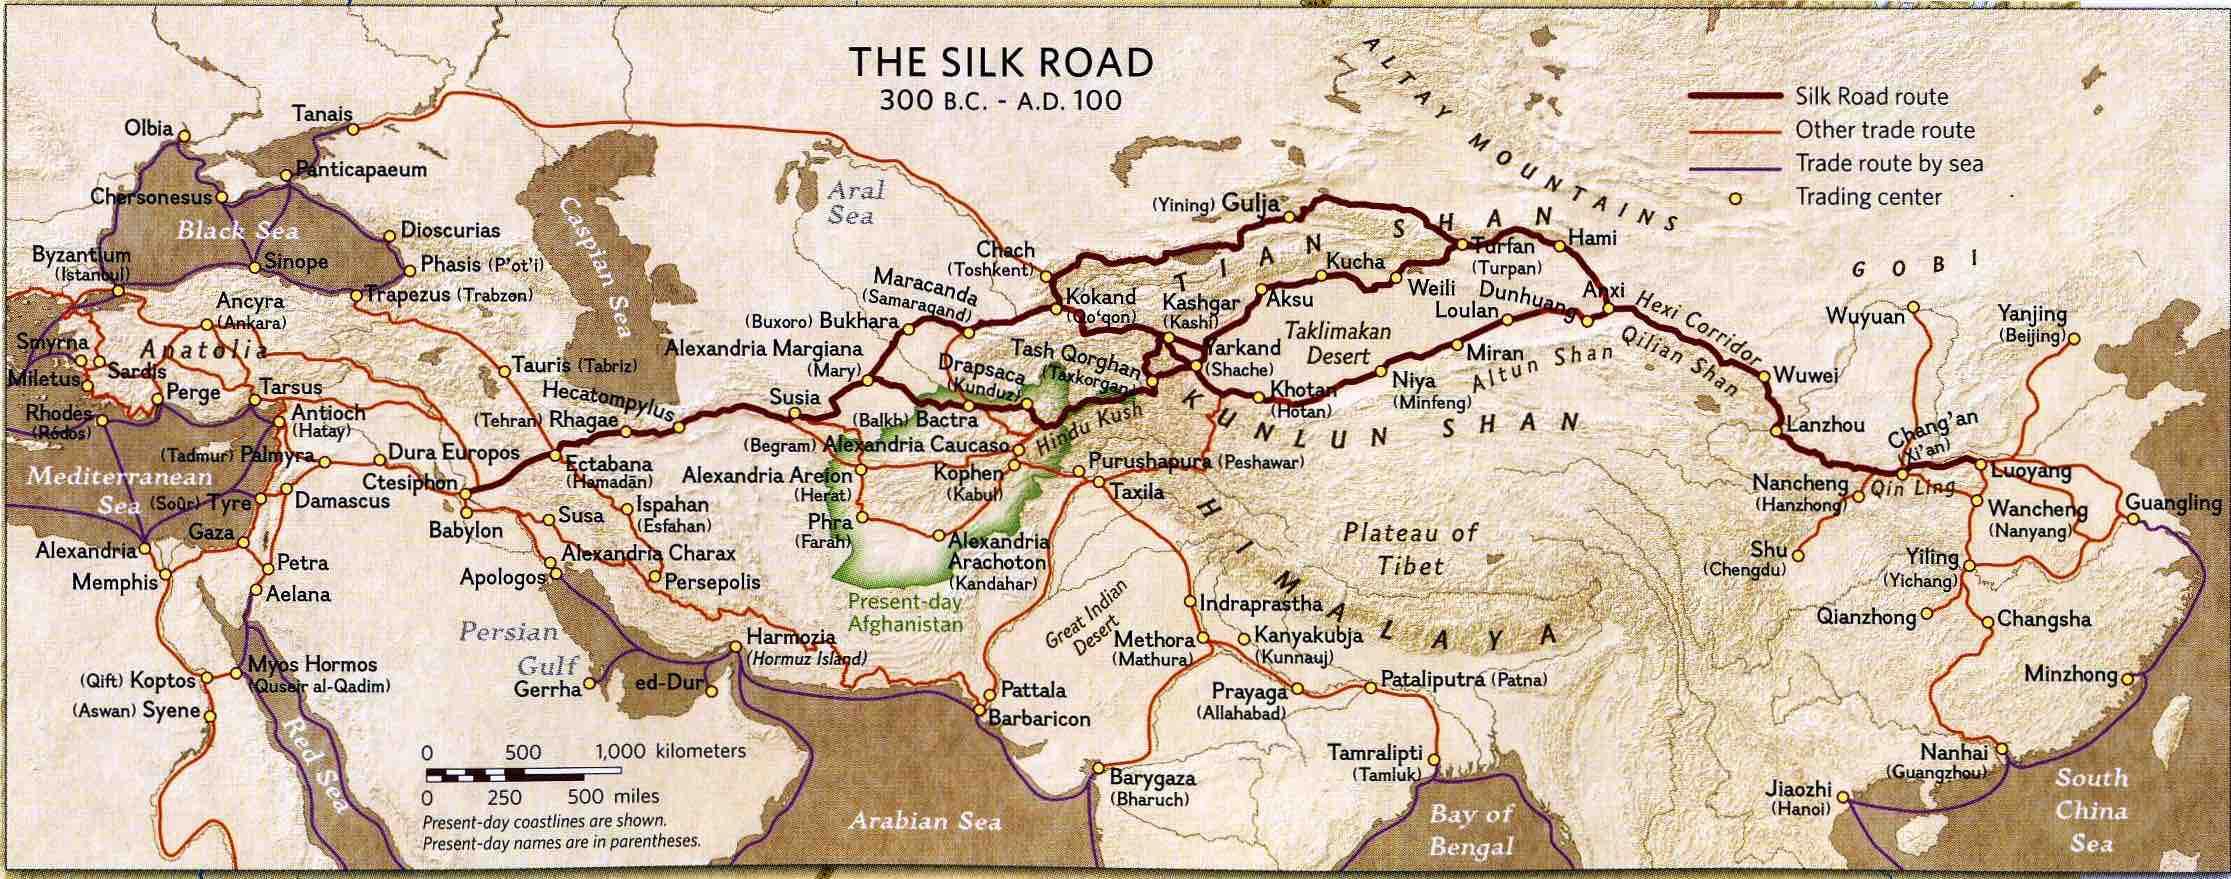 Cina Sebagai Pusat Peradaban Asia Timur dan Barat